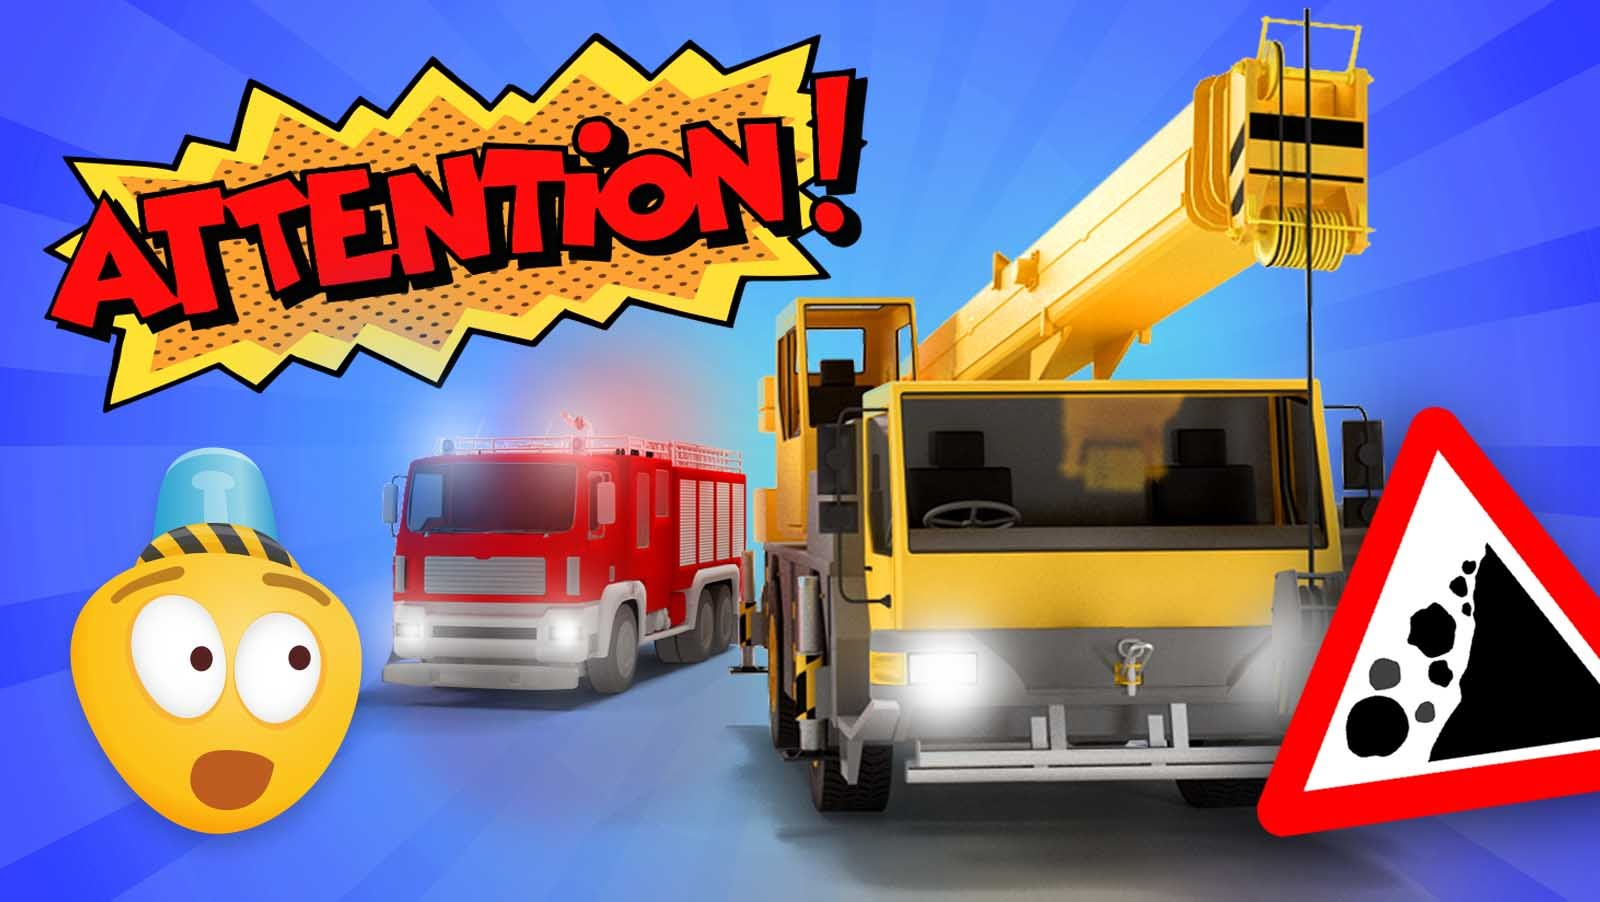 Fire Brigade & Construction Vehicles! Cartoon For Kids About Fire ...